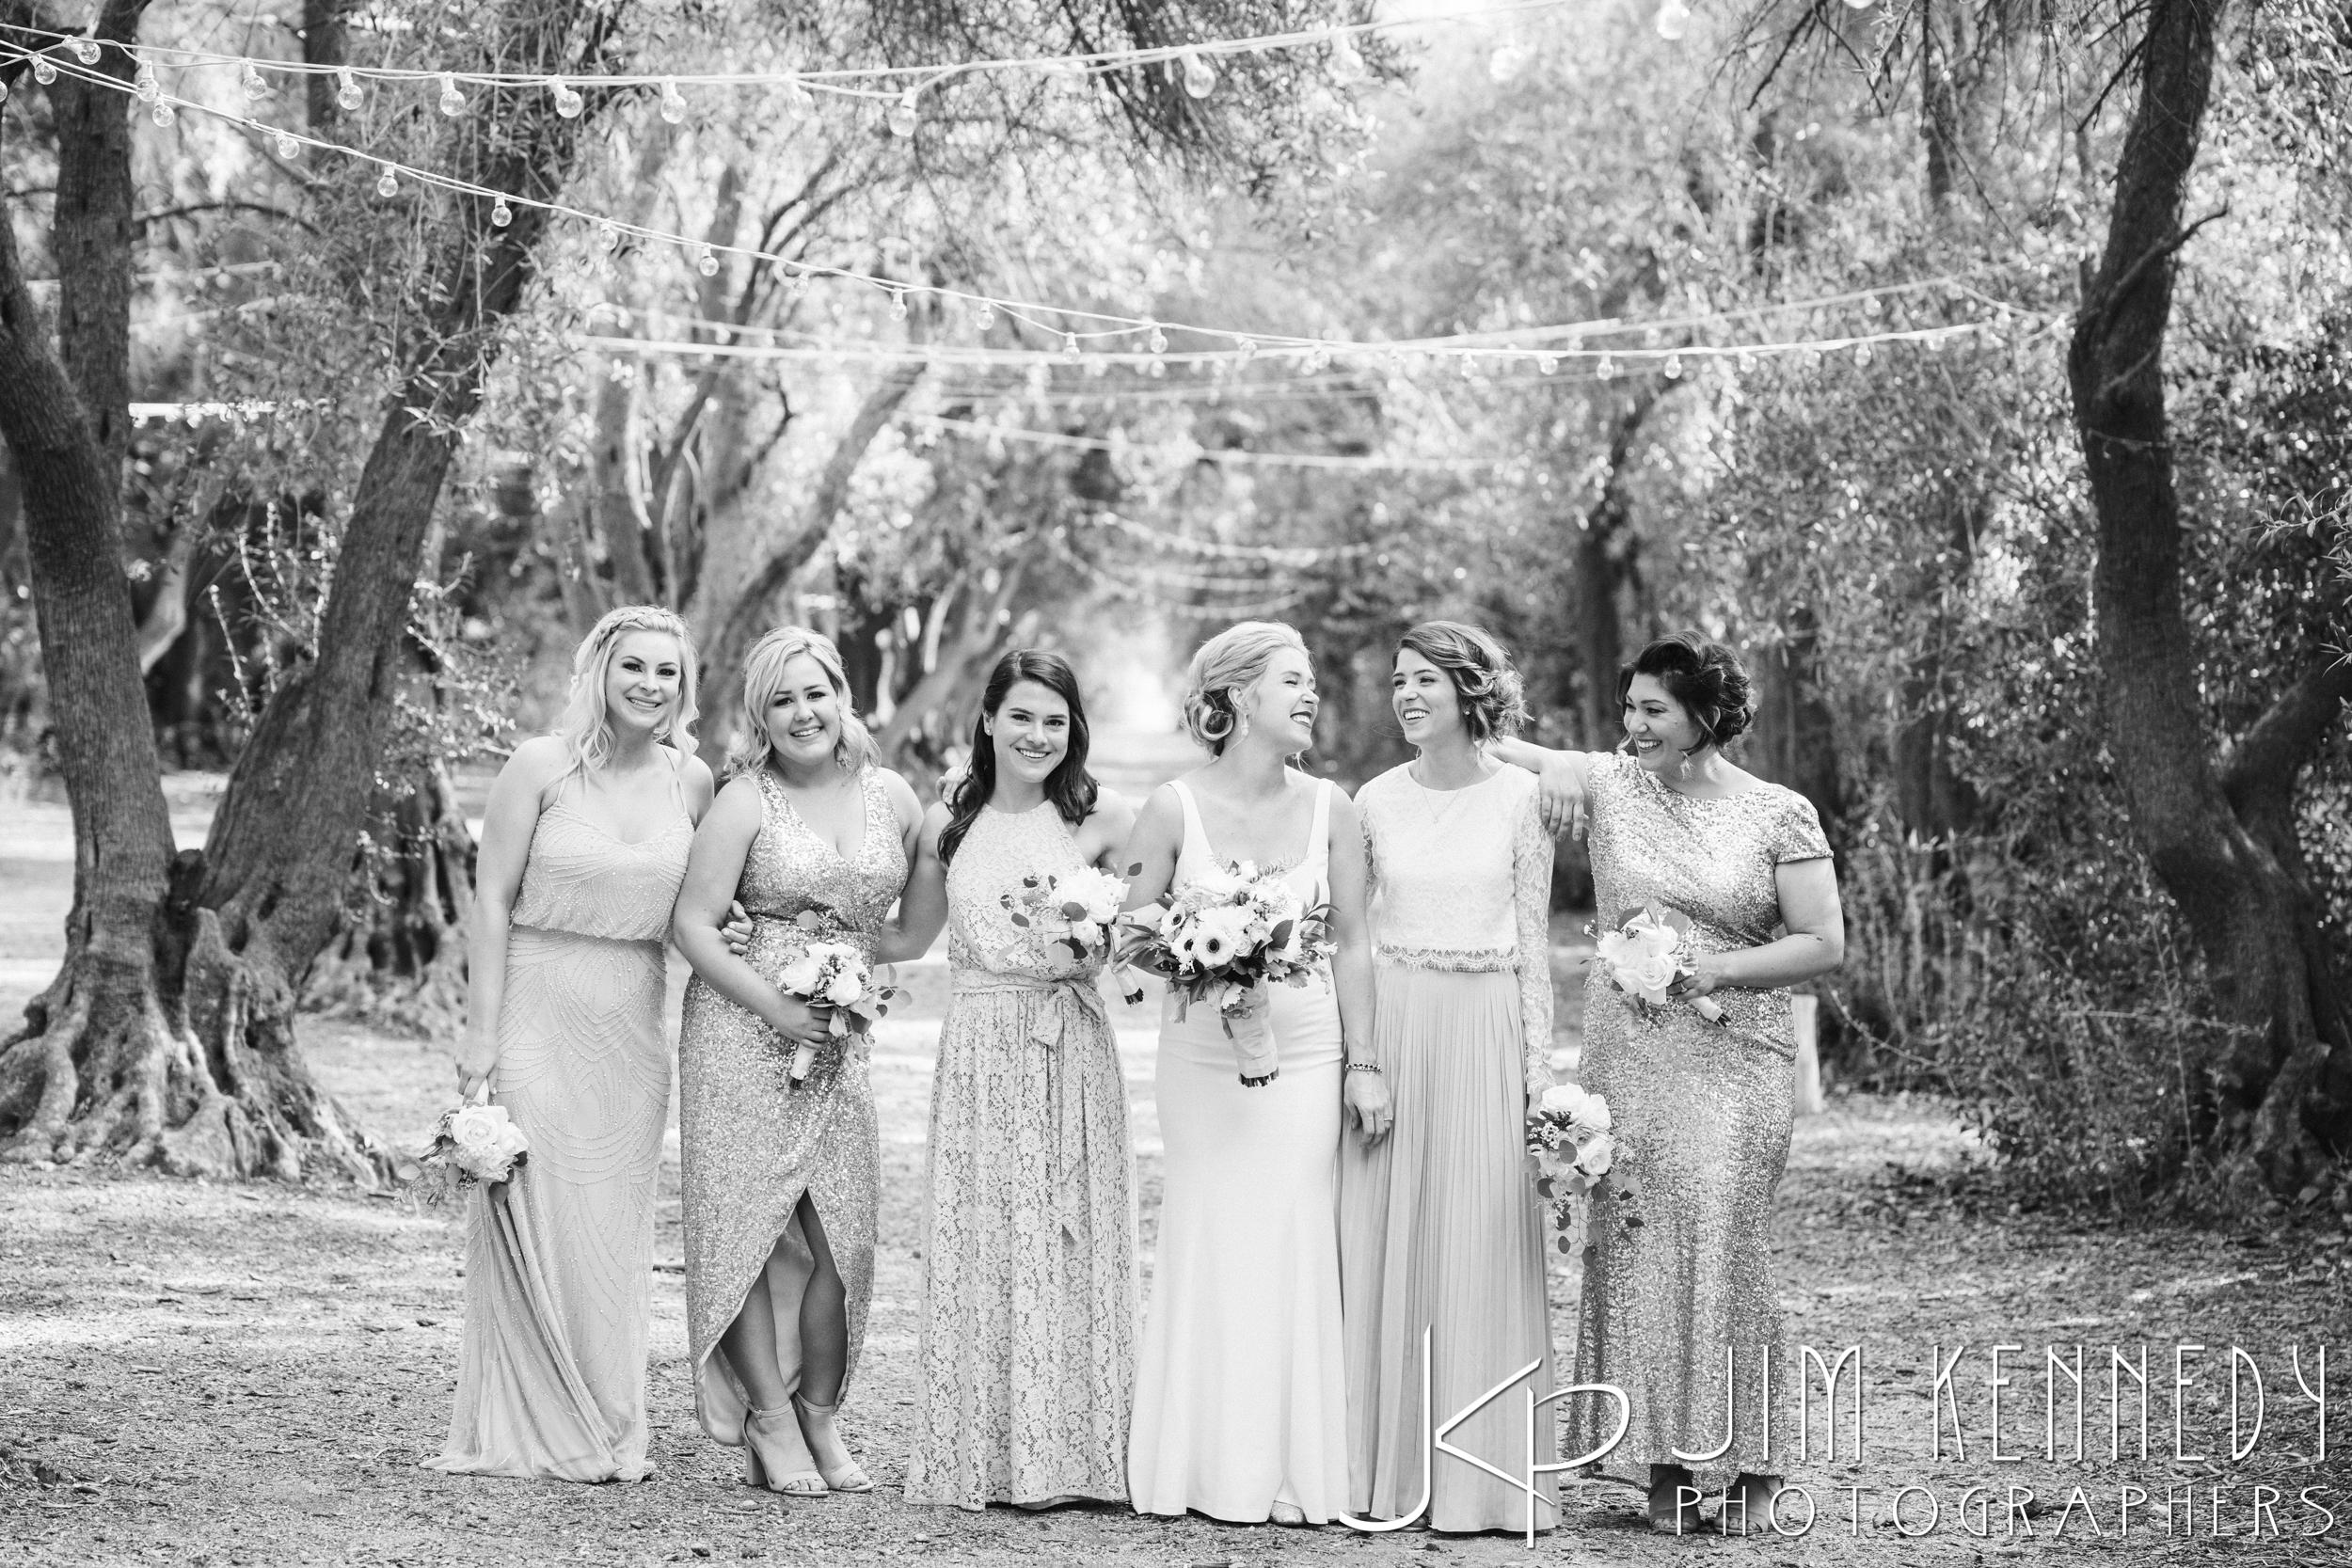 jim_kennedy_photographers_highland_springs_wedding_caitlyn_0061.jpg